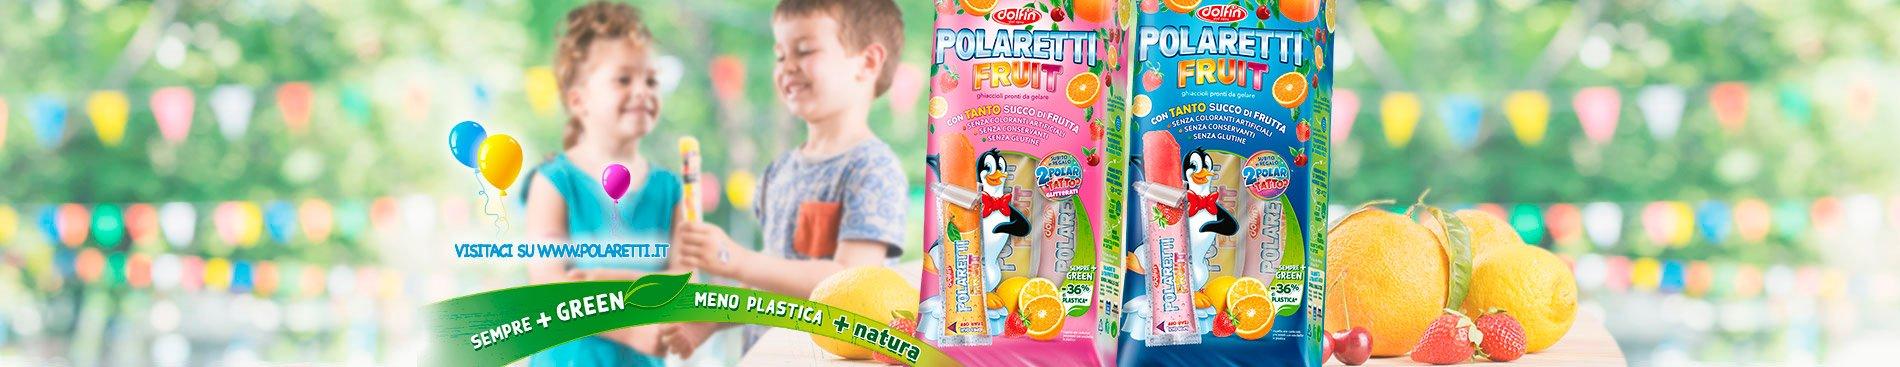 2020 Polaretti fruit